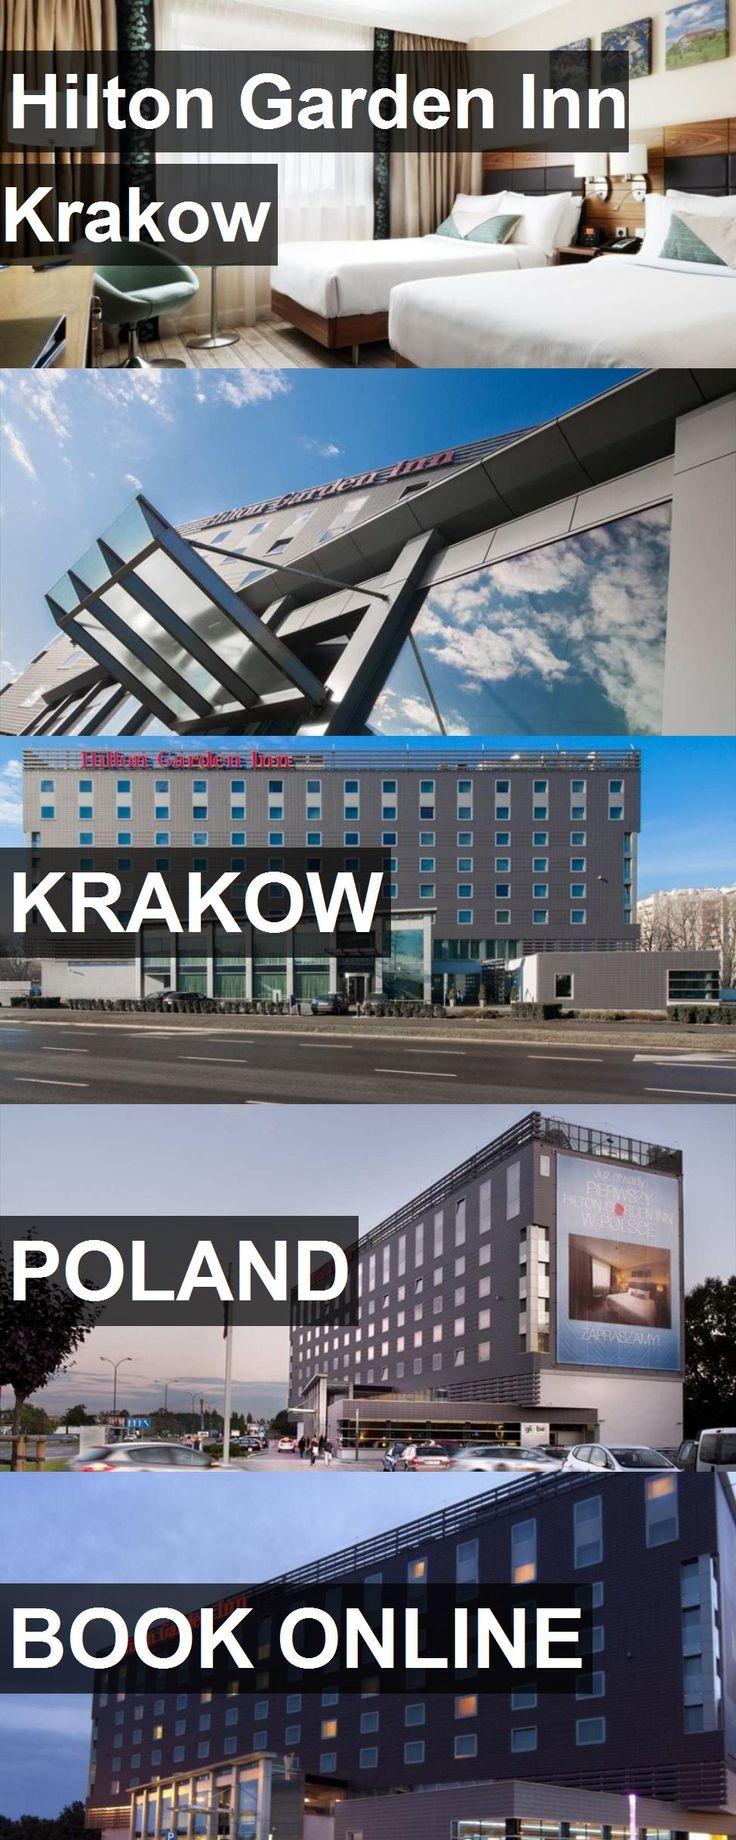 Hotel Hilton Garden Inn Krakow in Krakow, Poland. For more information, photos, reviews and best prices please follow the link. #Poland #Krakow #travel #vacation #hotel